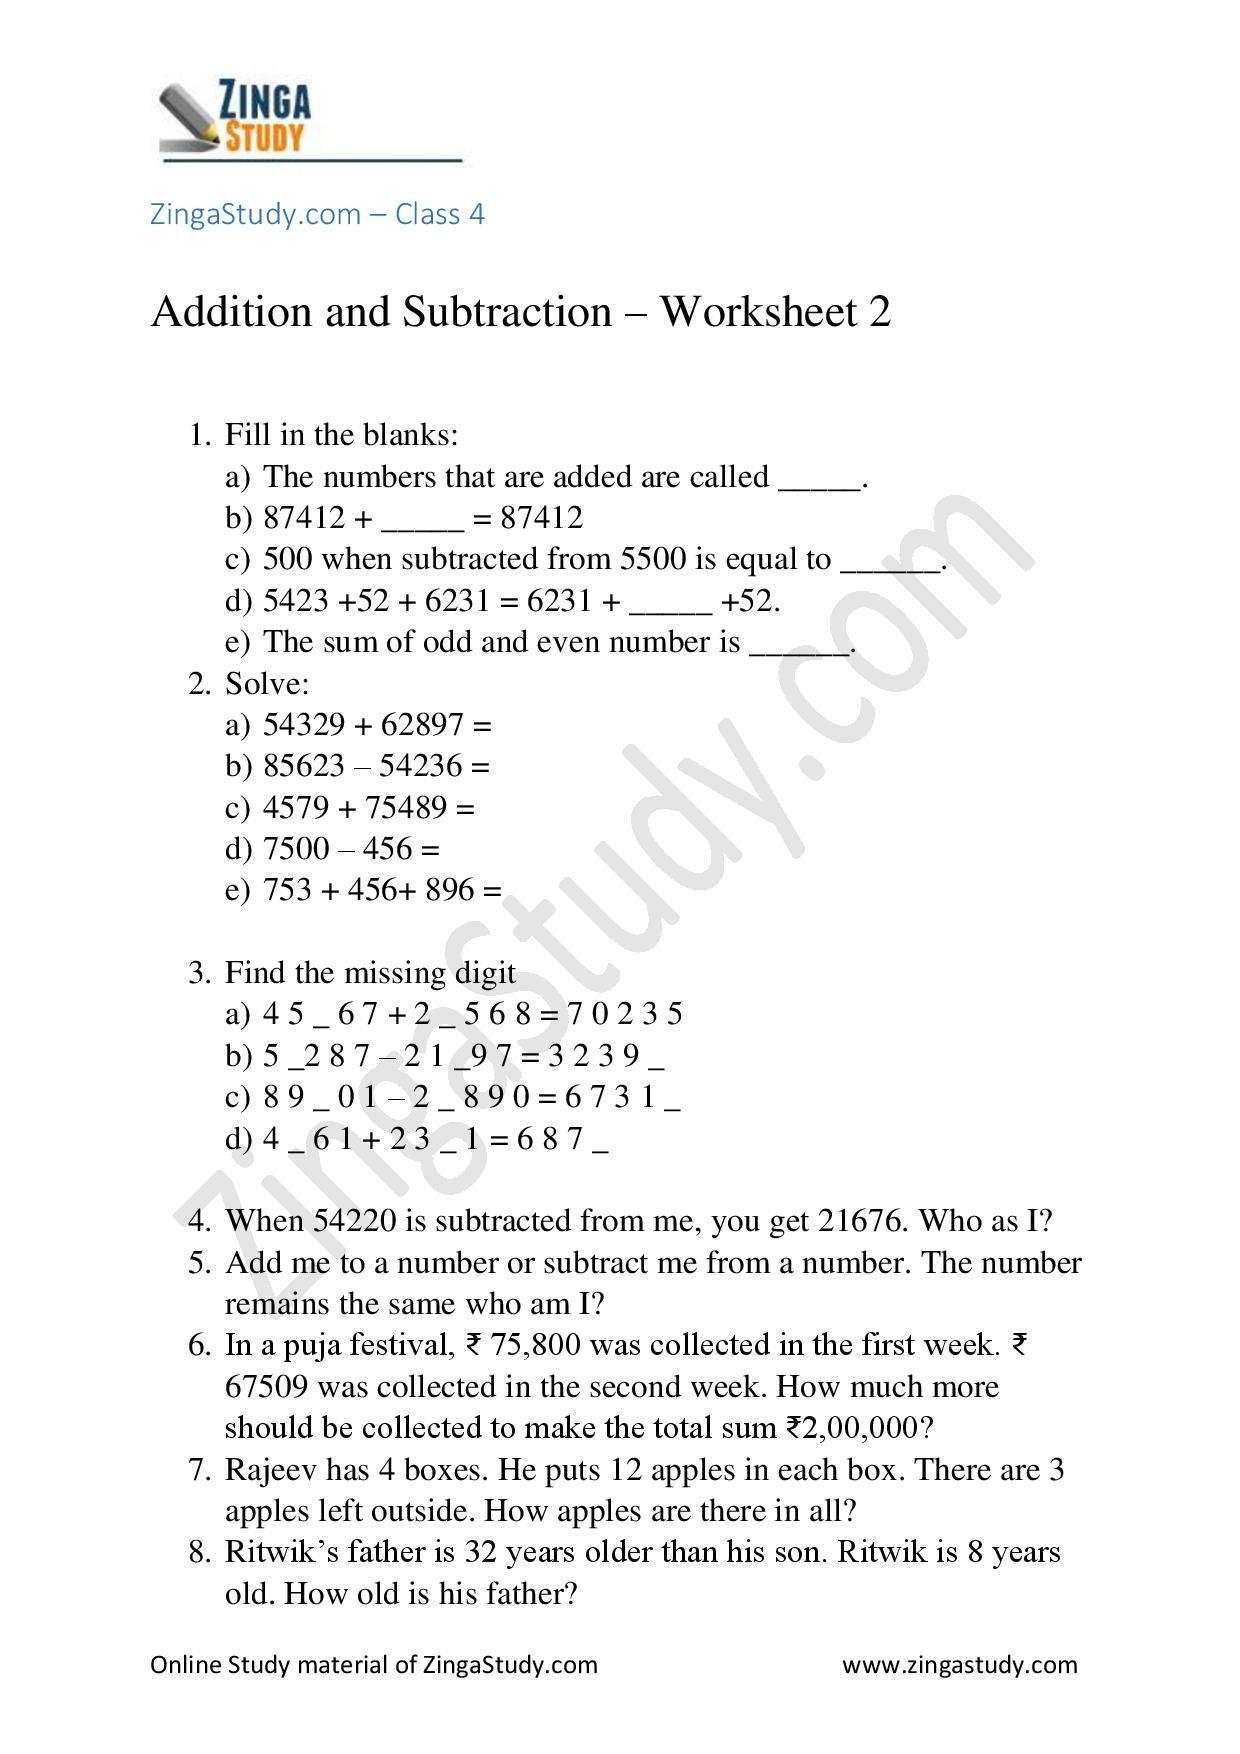 medium resolution of Addition / Subtraction - Worksheet 2 for grade 4   Subtraction worksheets